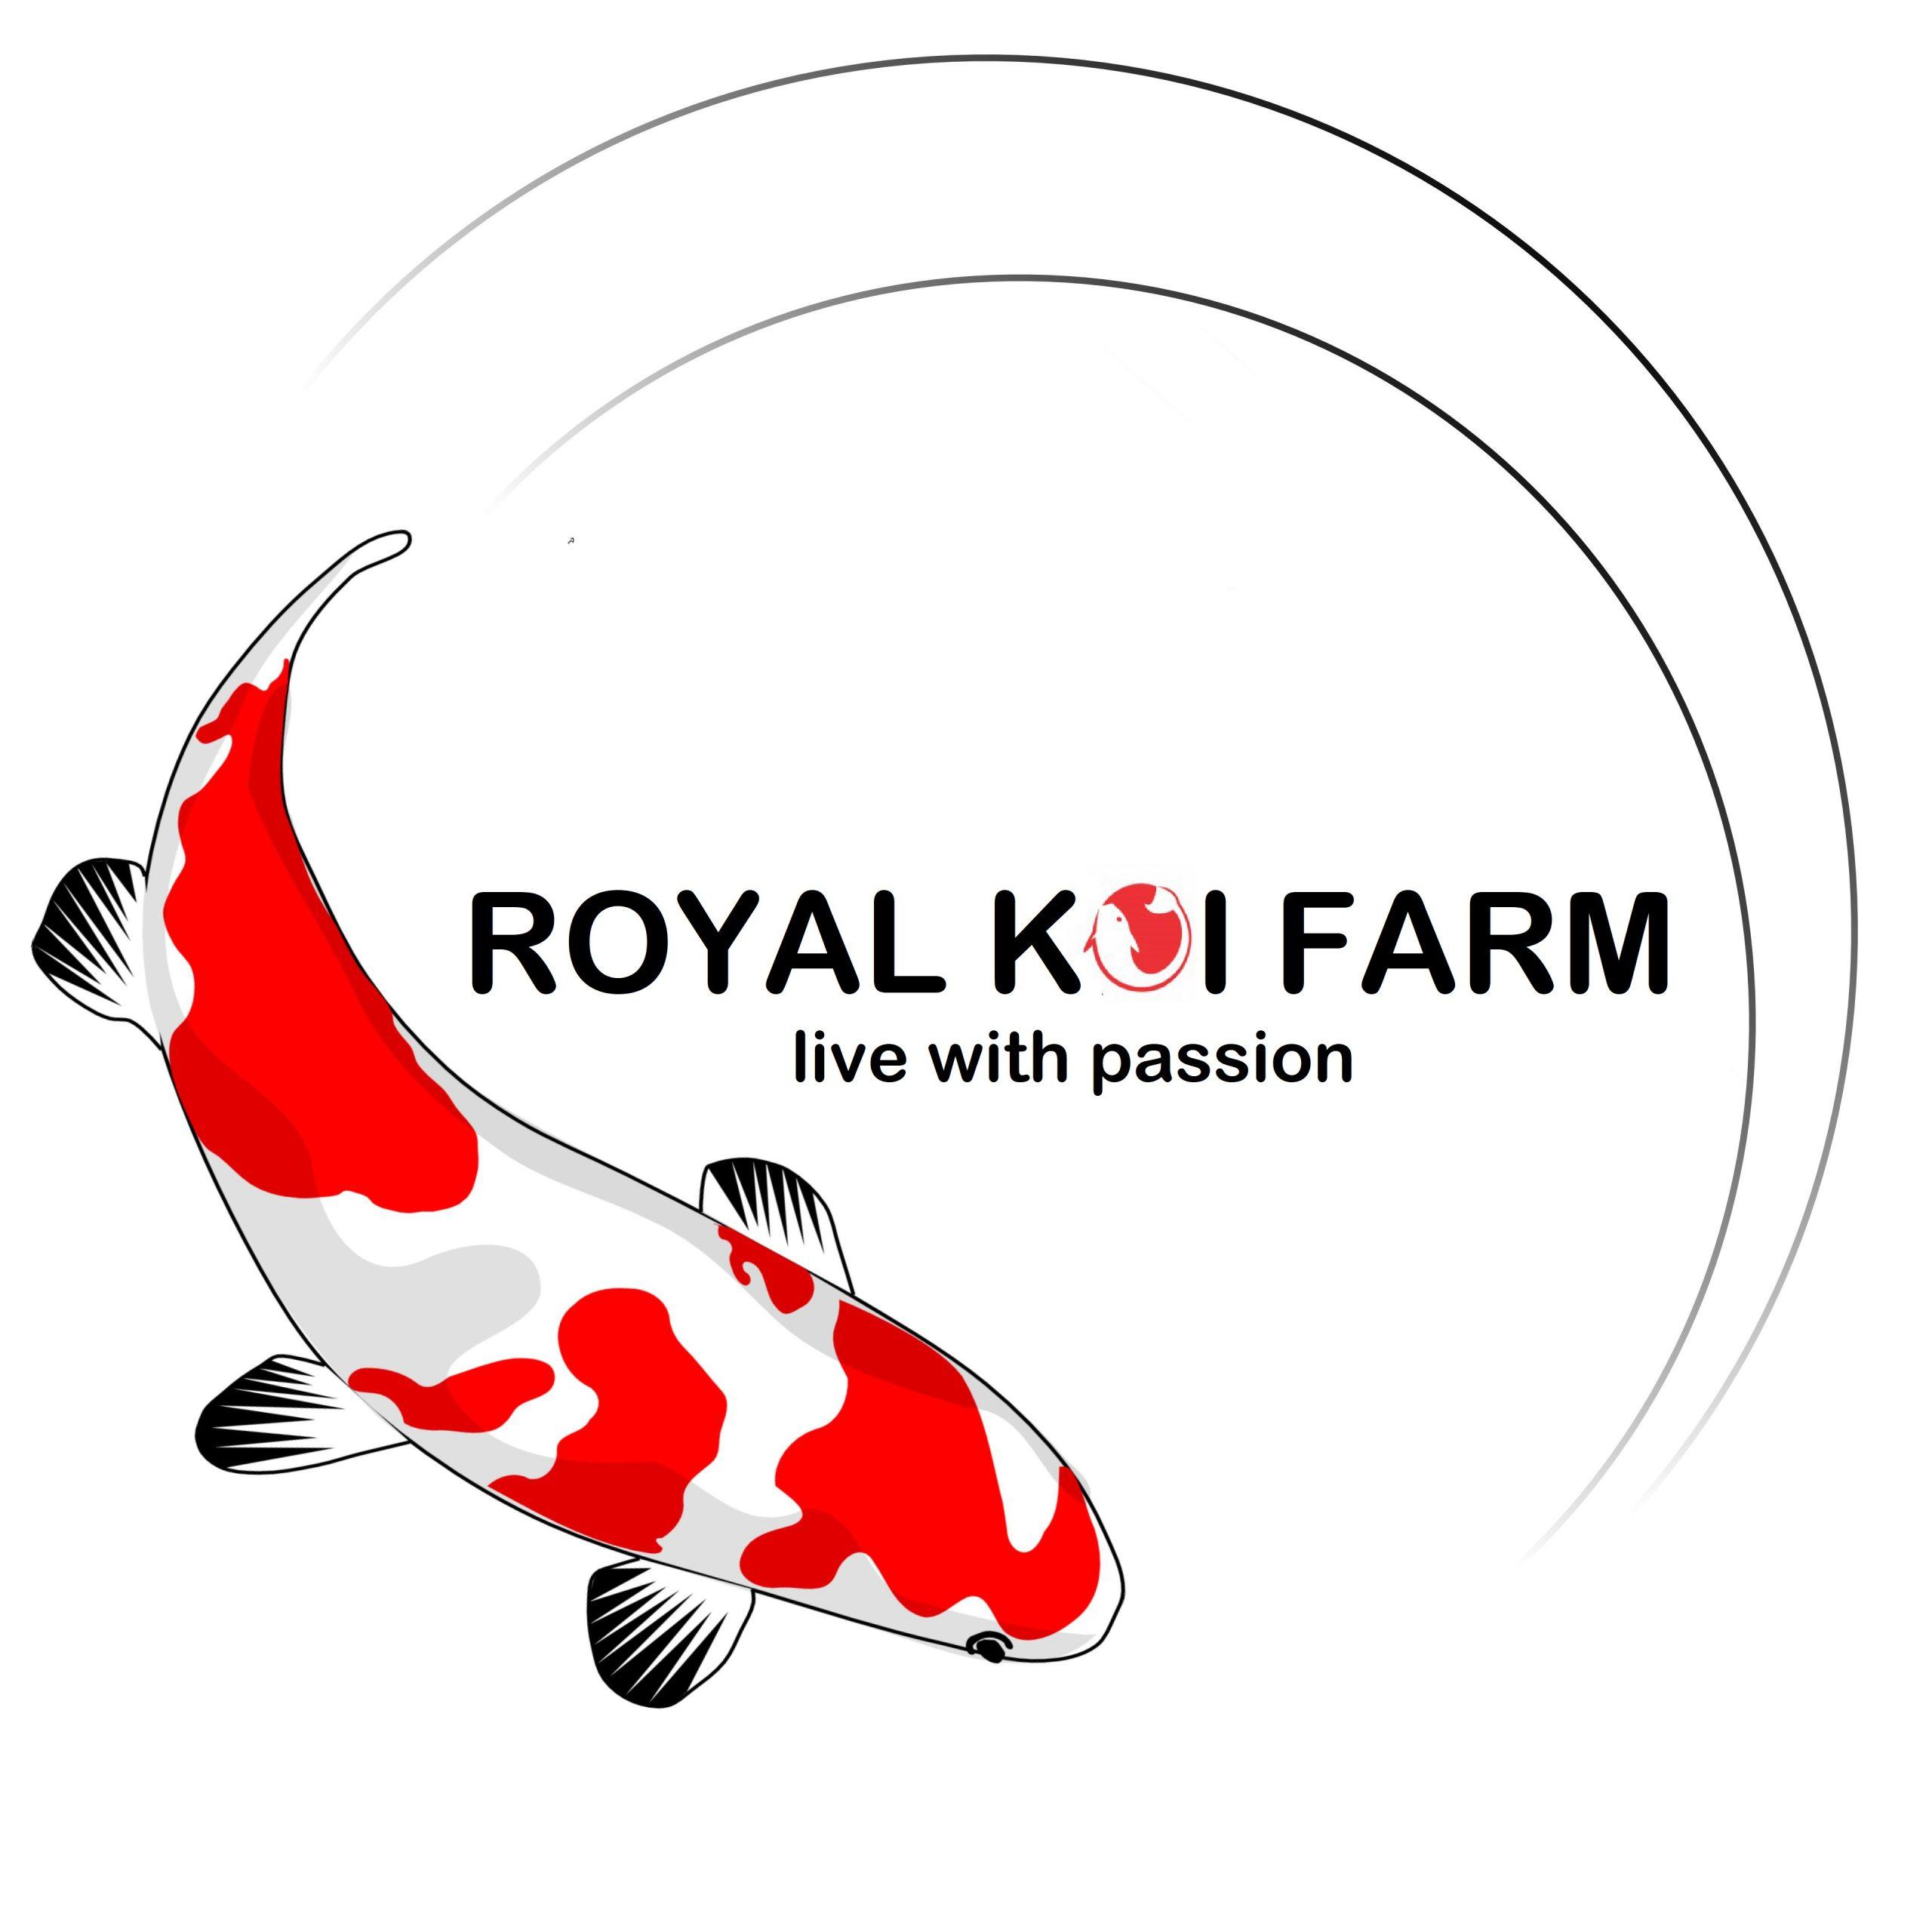 ROYAL KOI FARM